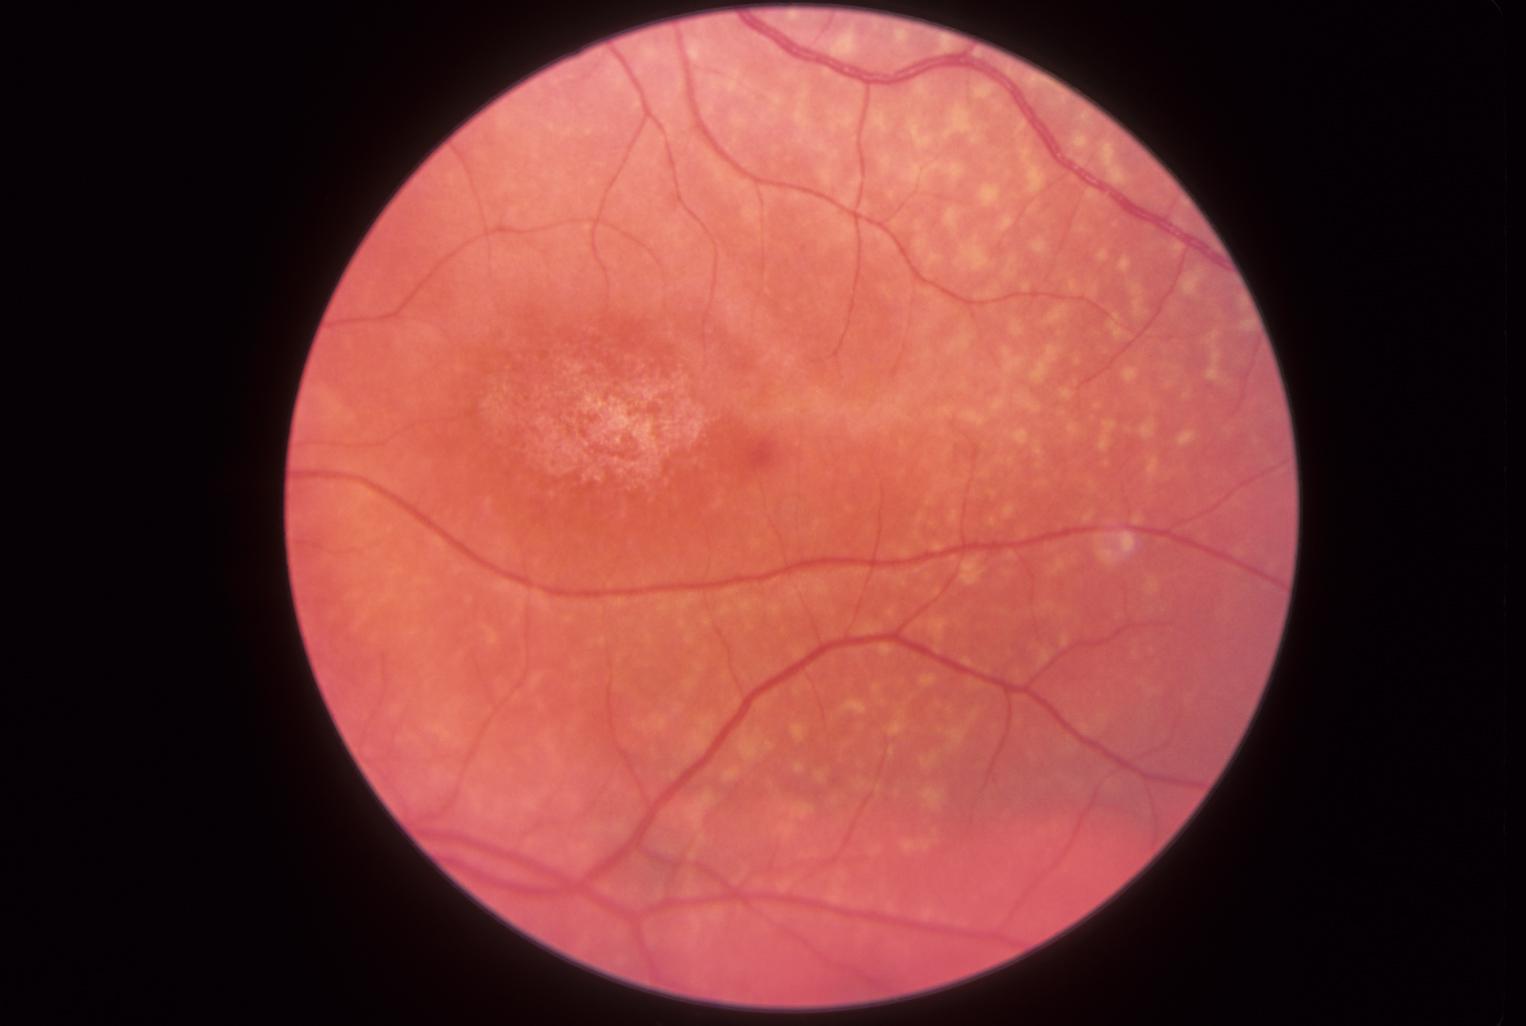 Fundus view of Stargardt disease